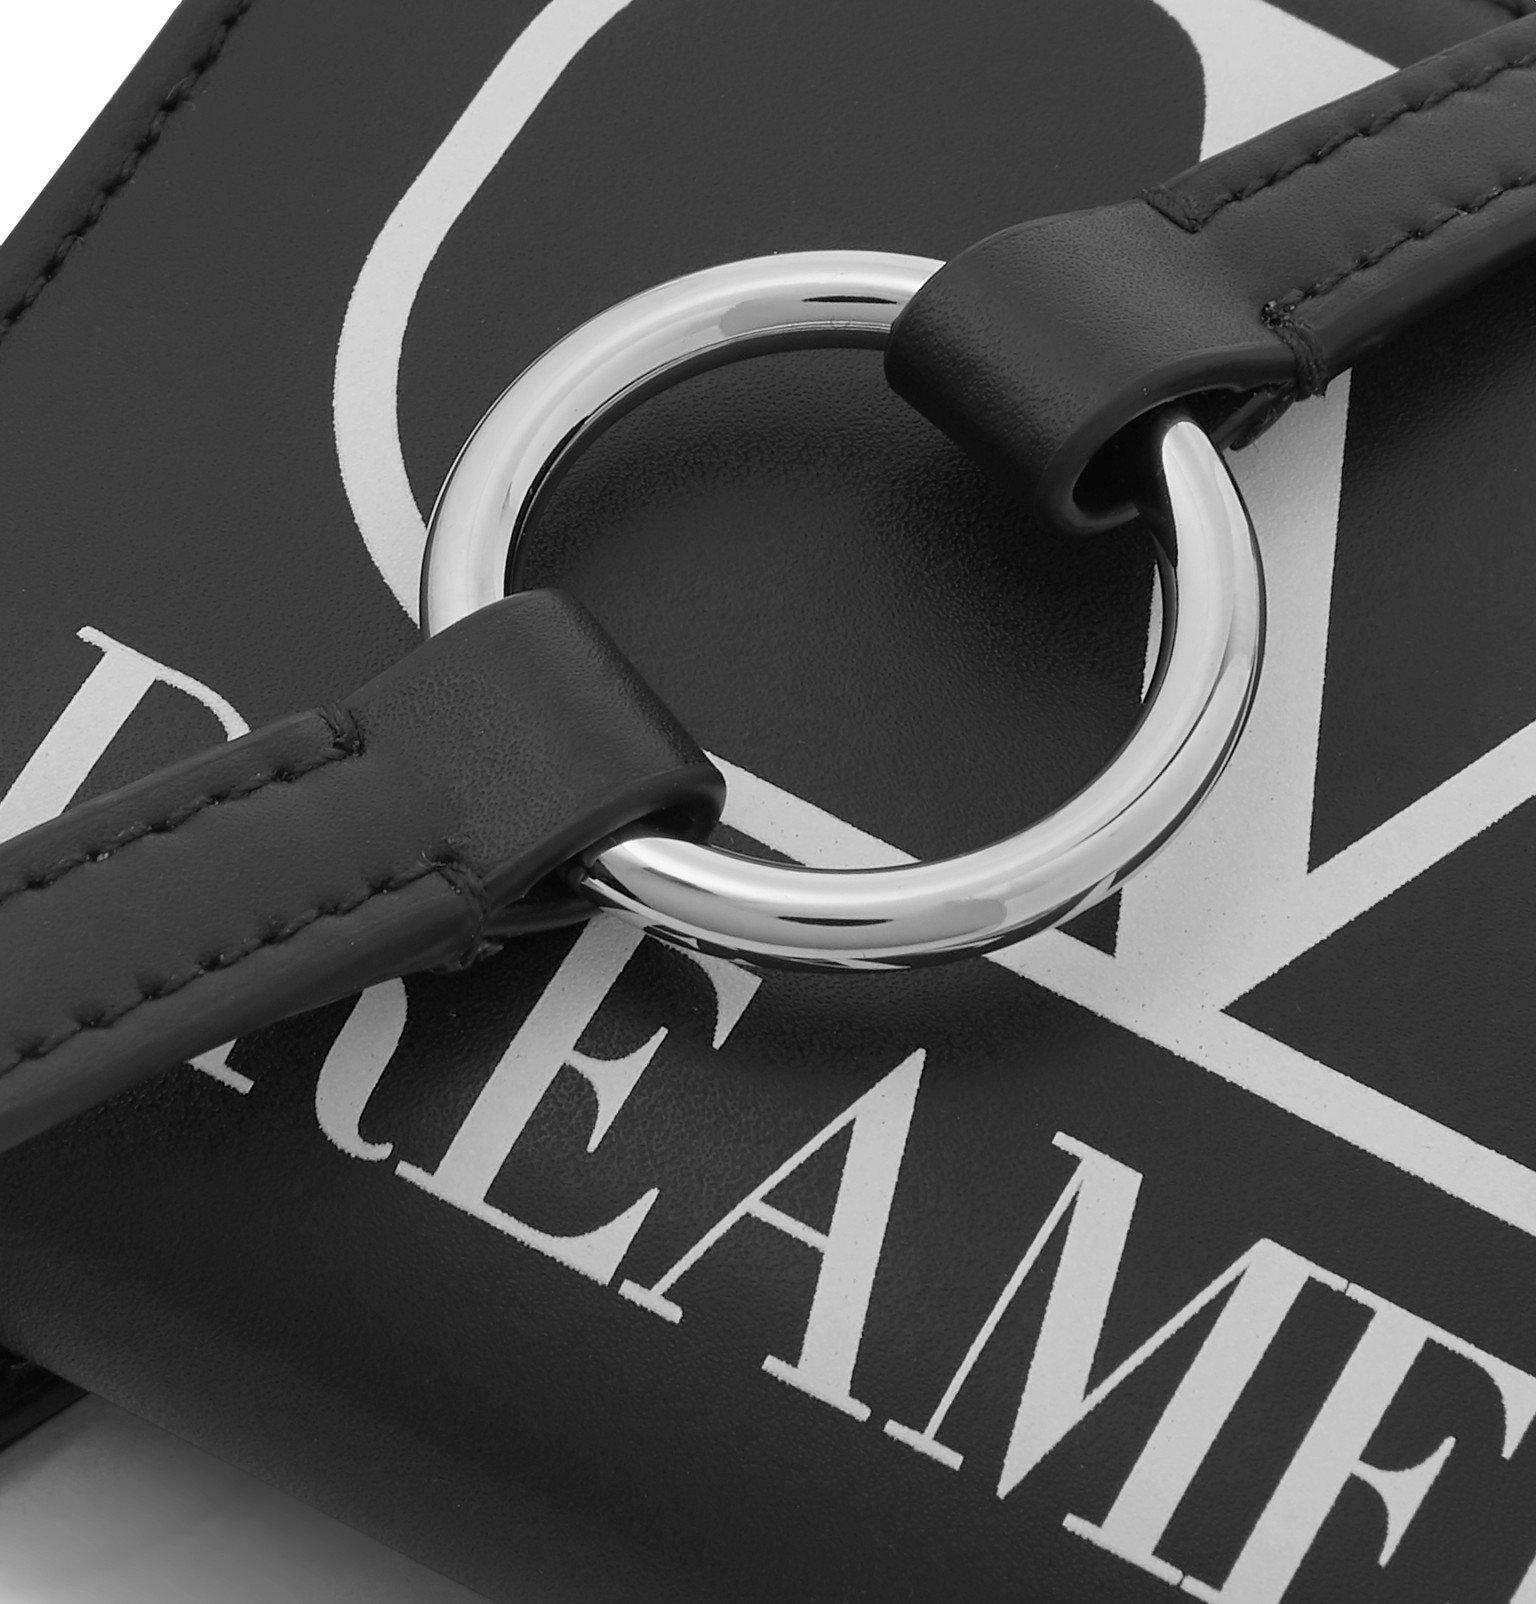 Valentino - Valentino Garavani Logo-Print Leather Zipped Wallet with Lanyard - Black